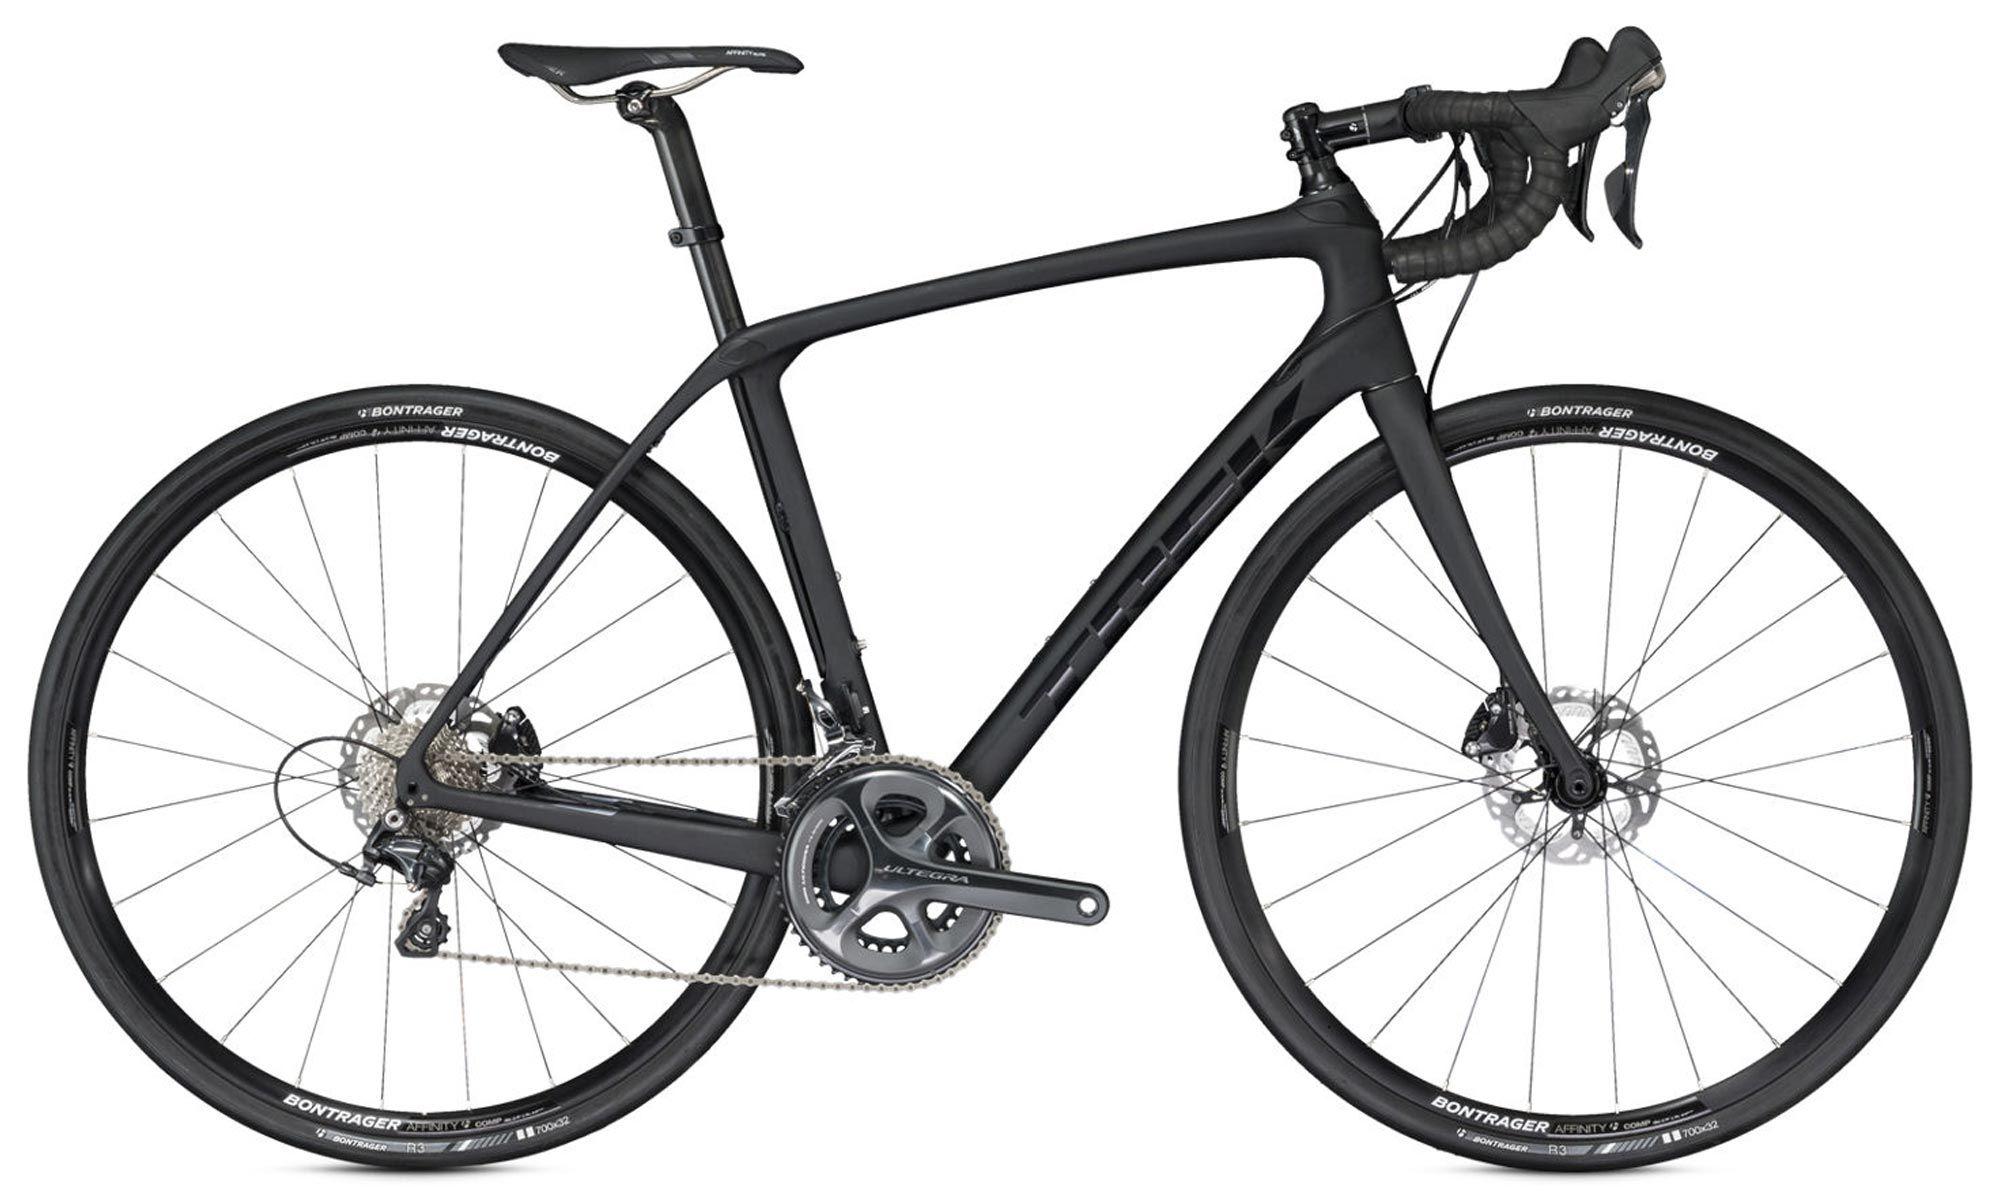 Trek Domane SLR 6 2017 Disc Endurance Carbon Road Bike